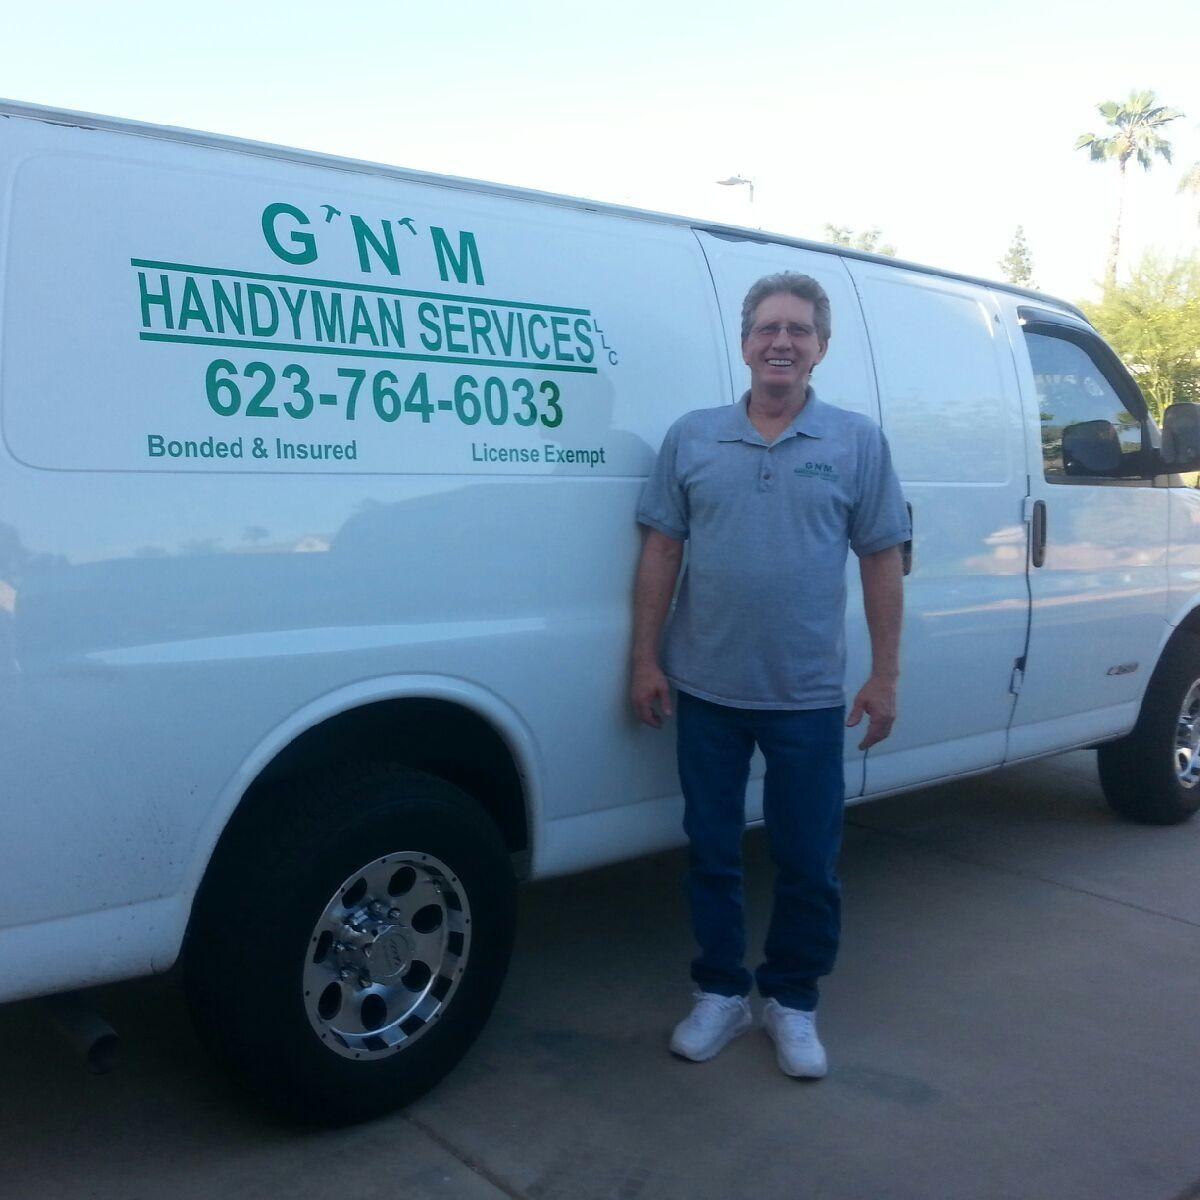 GnM Handyman Services,LLC